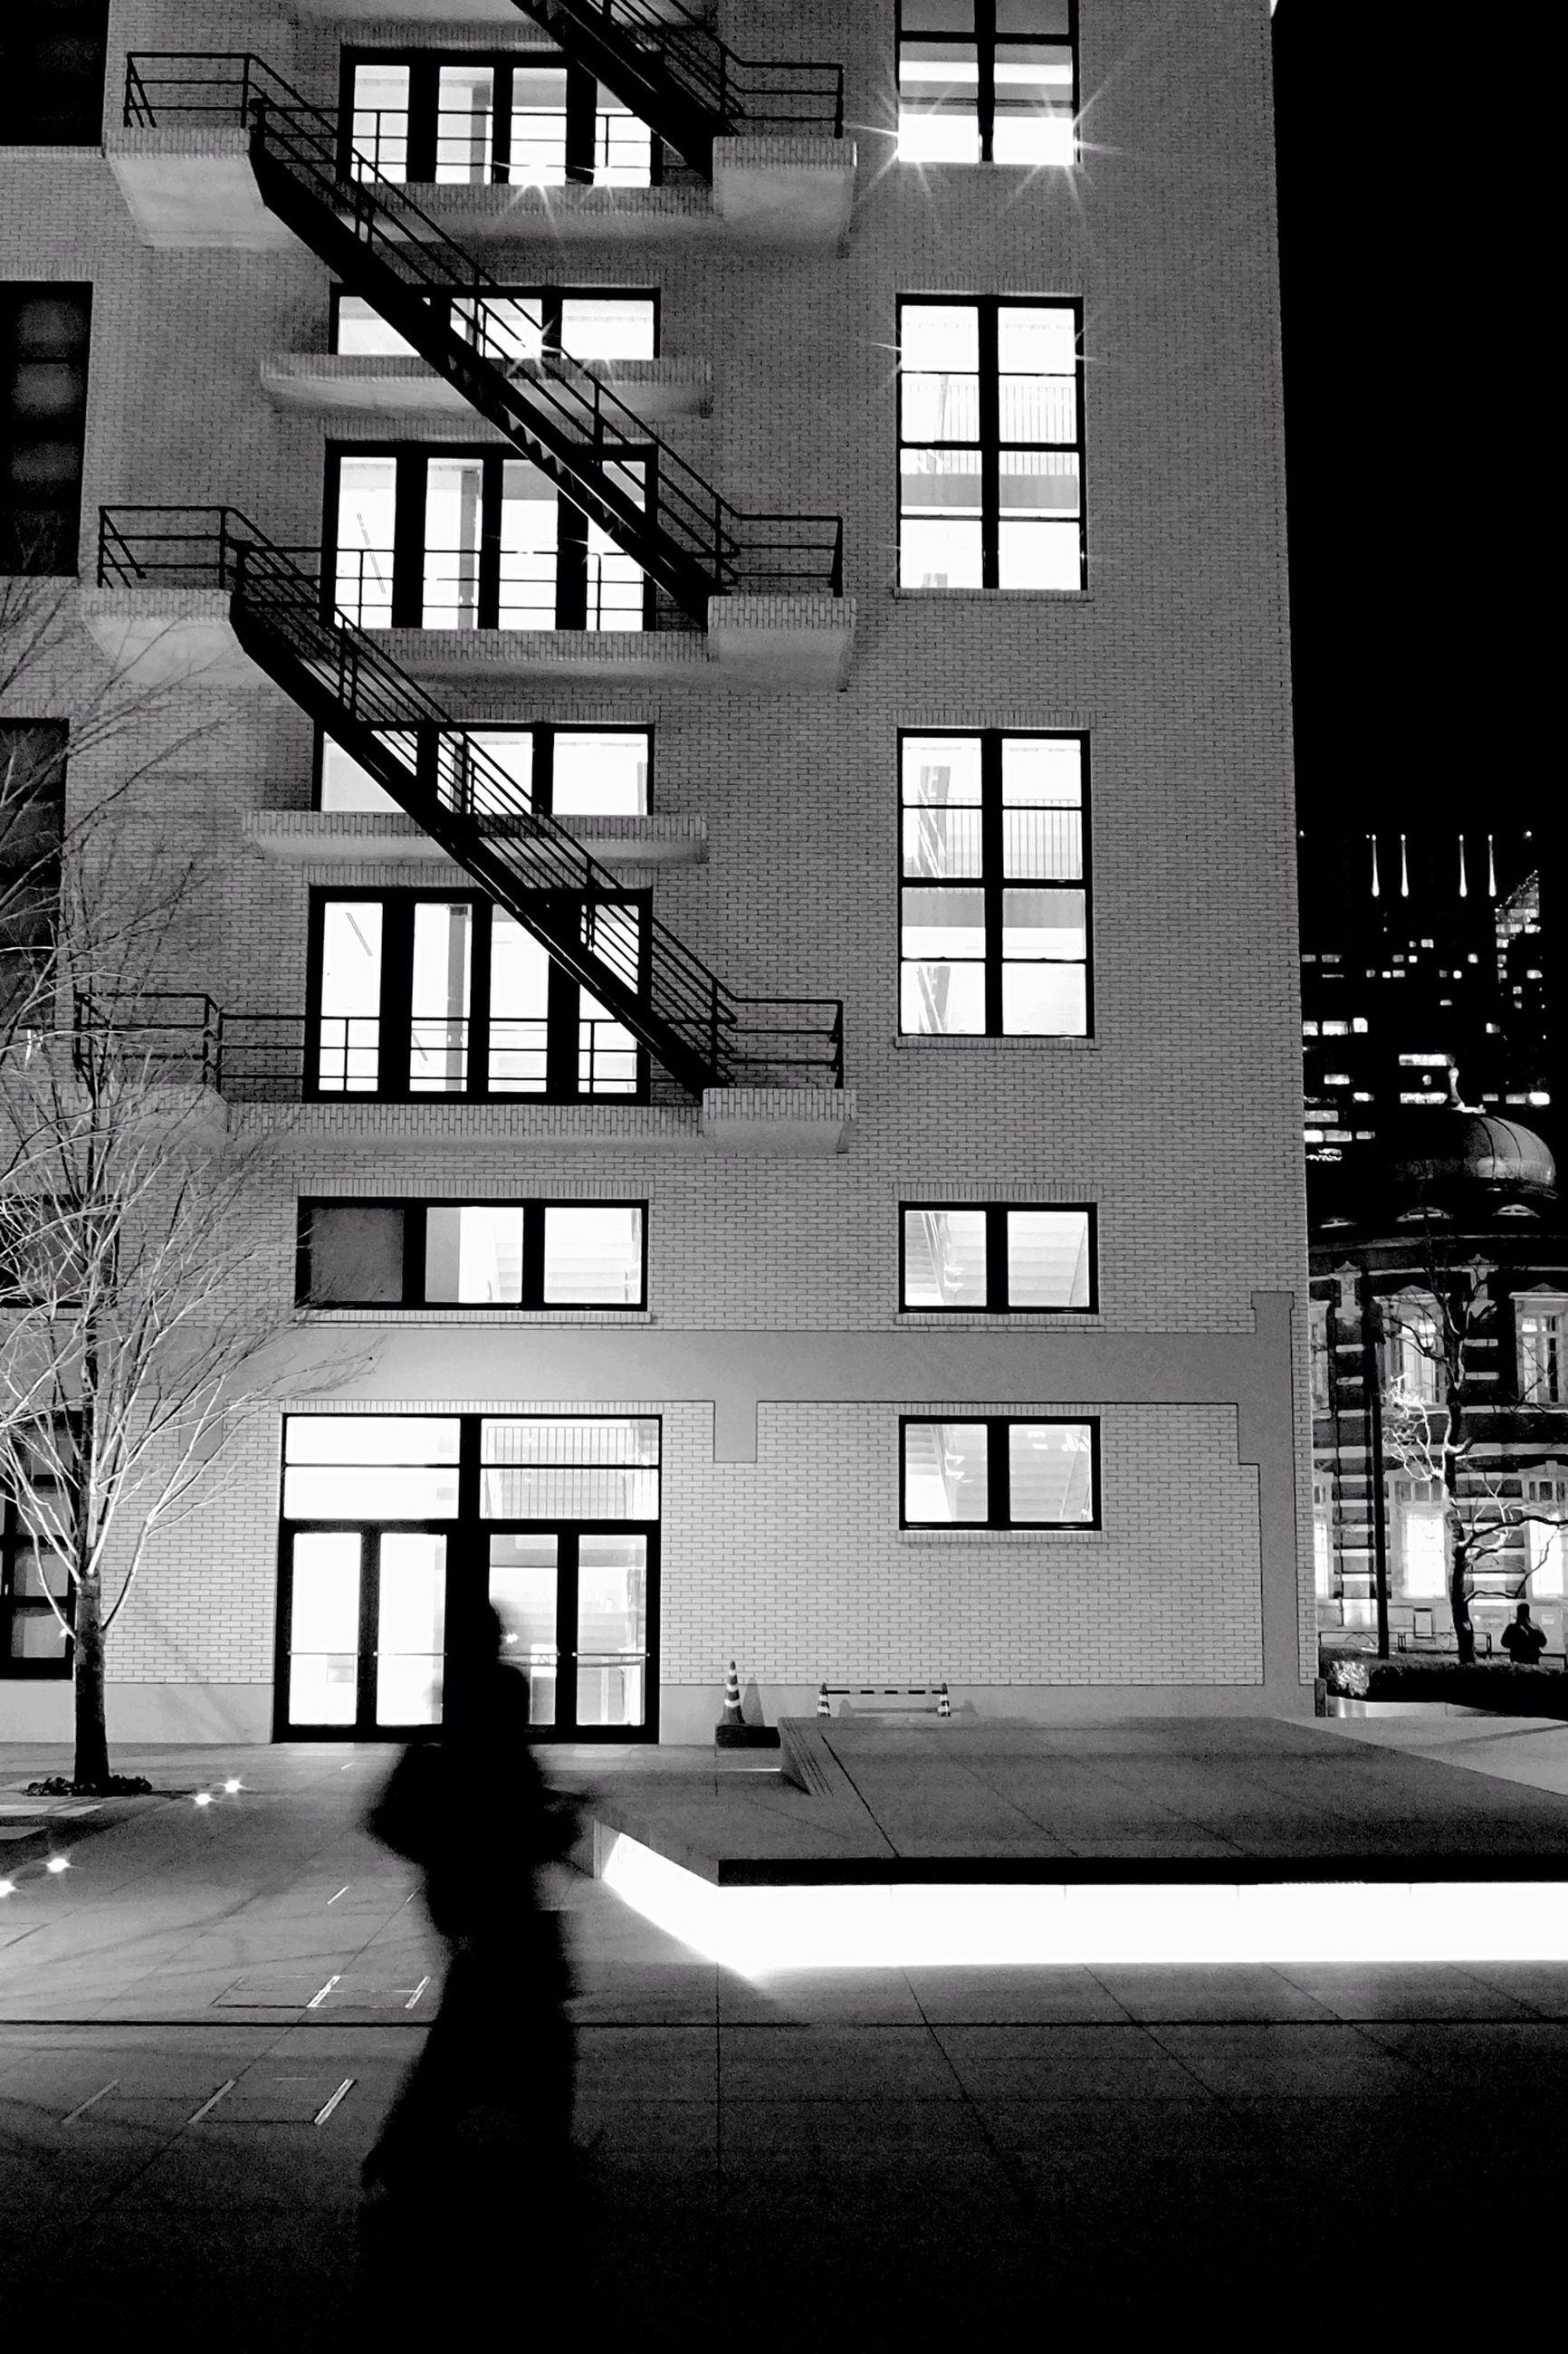 architecture, building exterior, built structure, city, street, building, window, city life, men, silhouette, shadow, lifestyles, unrecognizable person, walking, road, sunlight, transportation, residential building